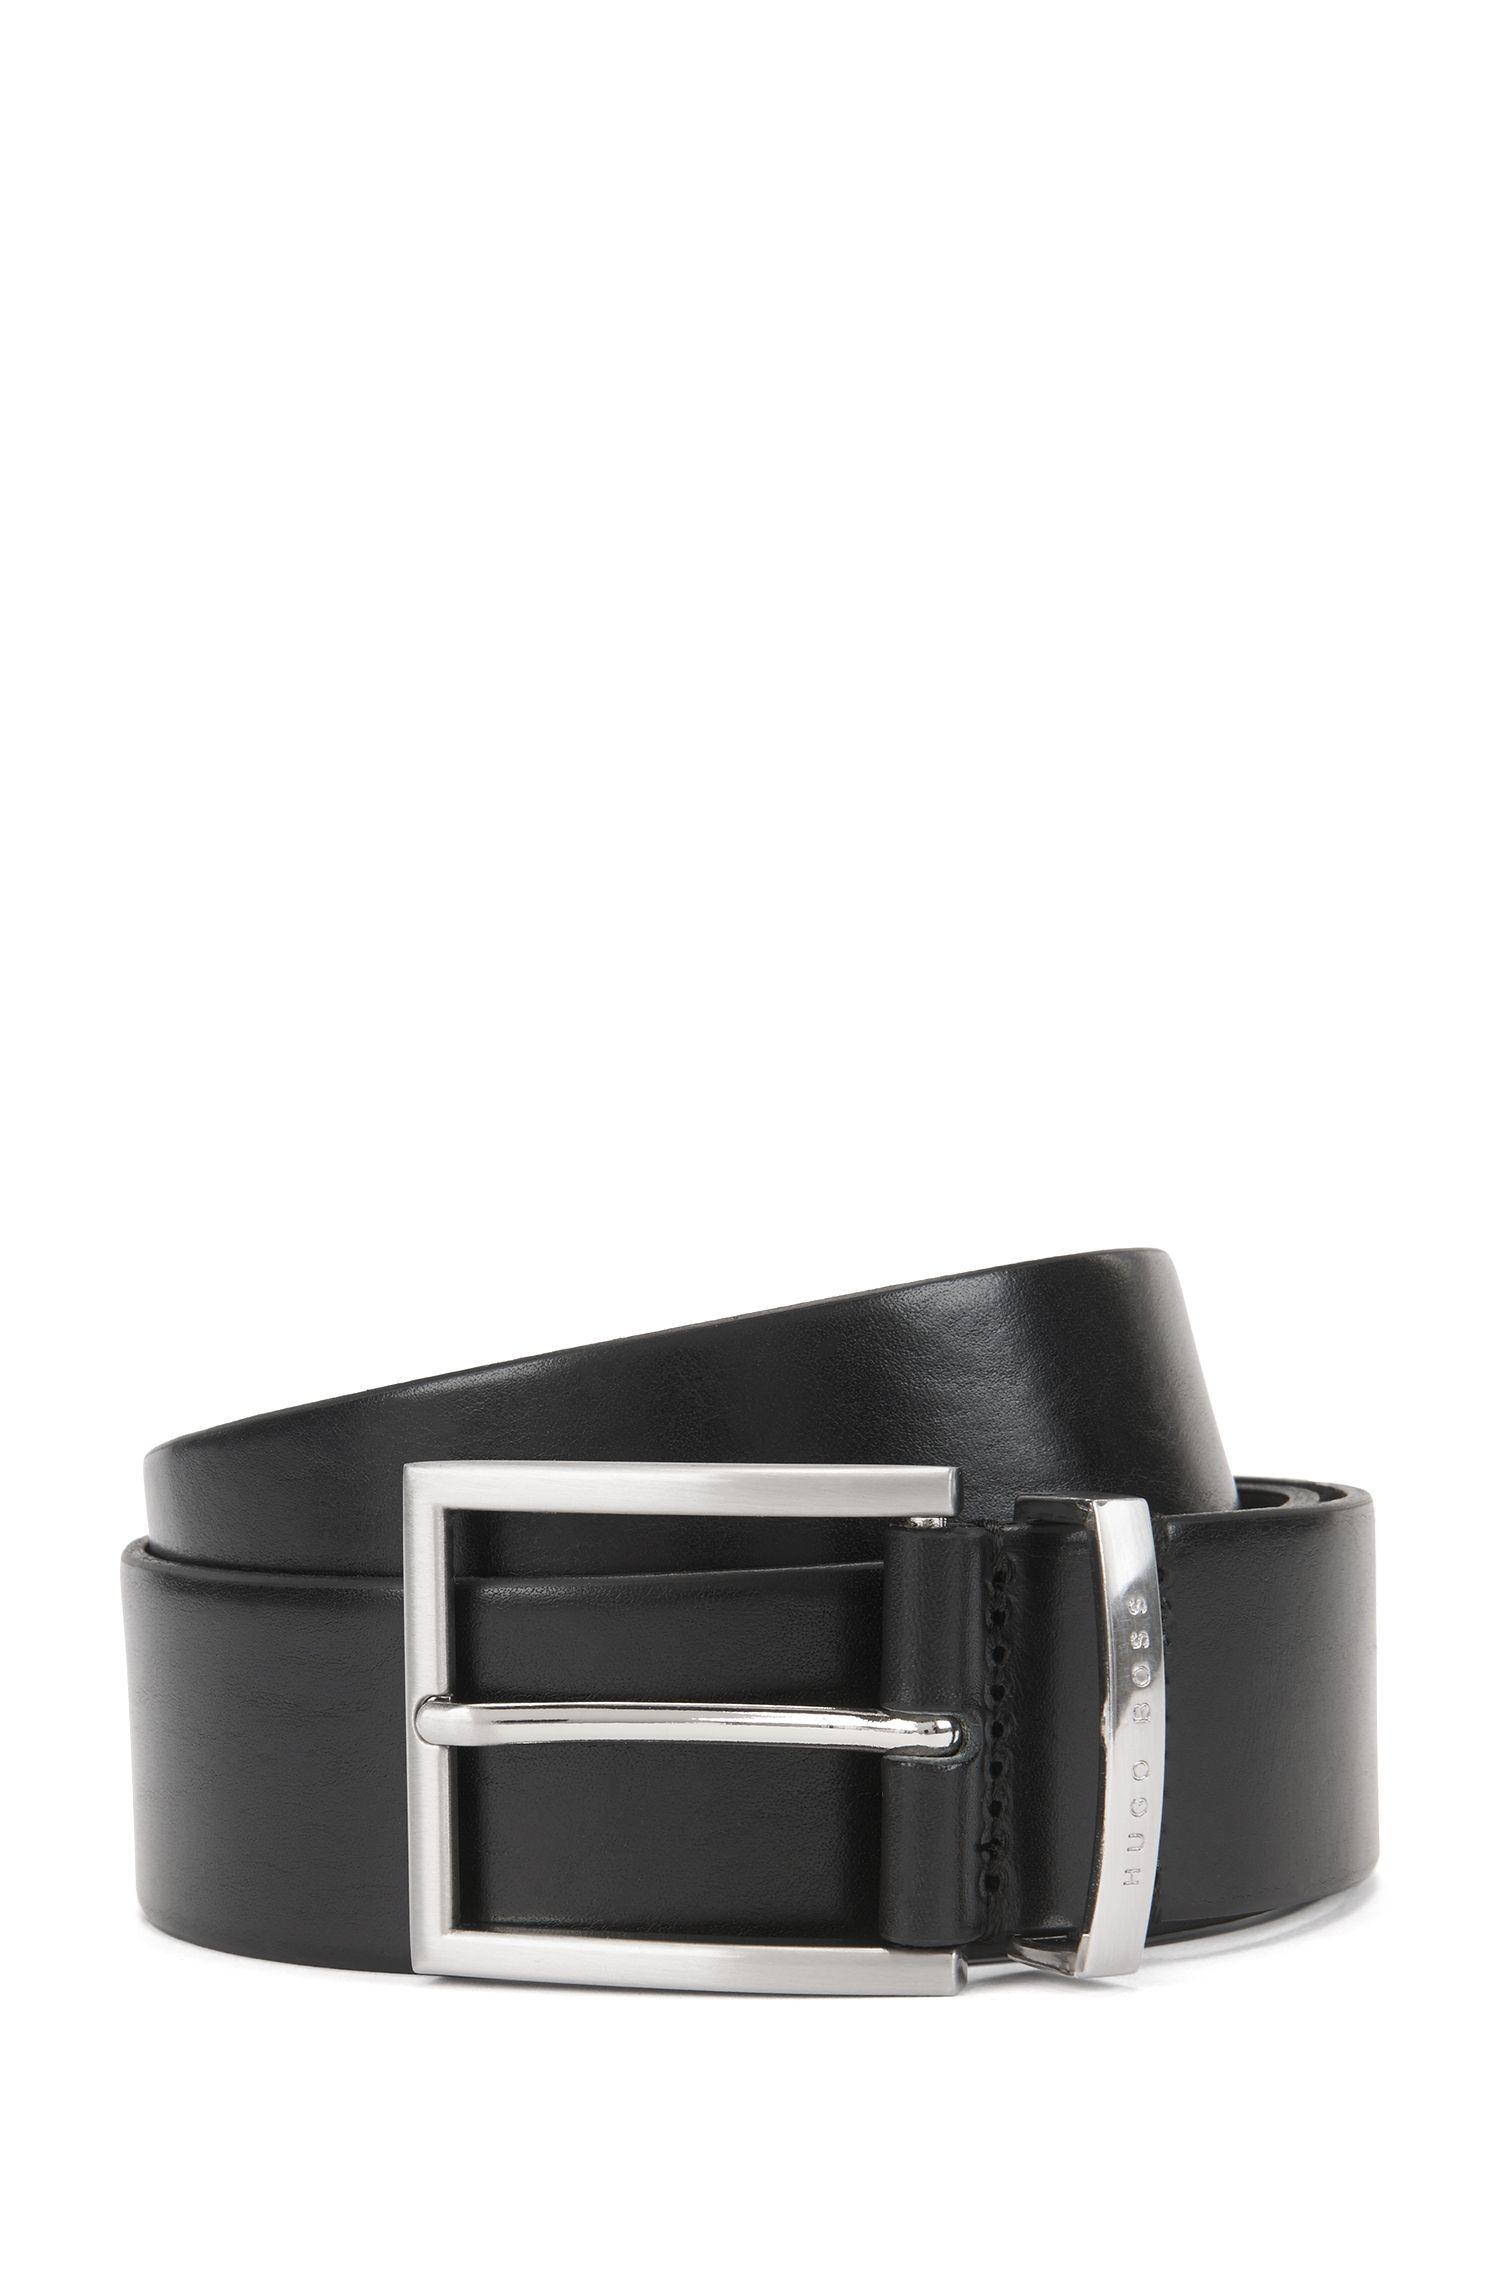 'Buddy' | Leather Belt